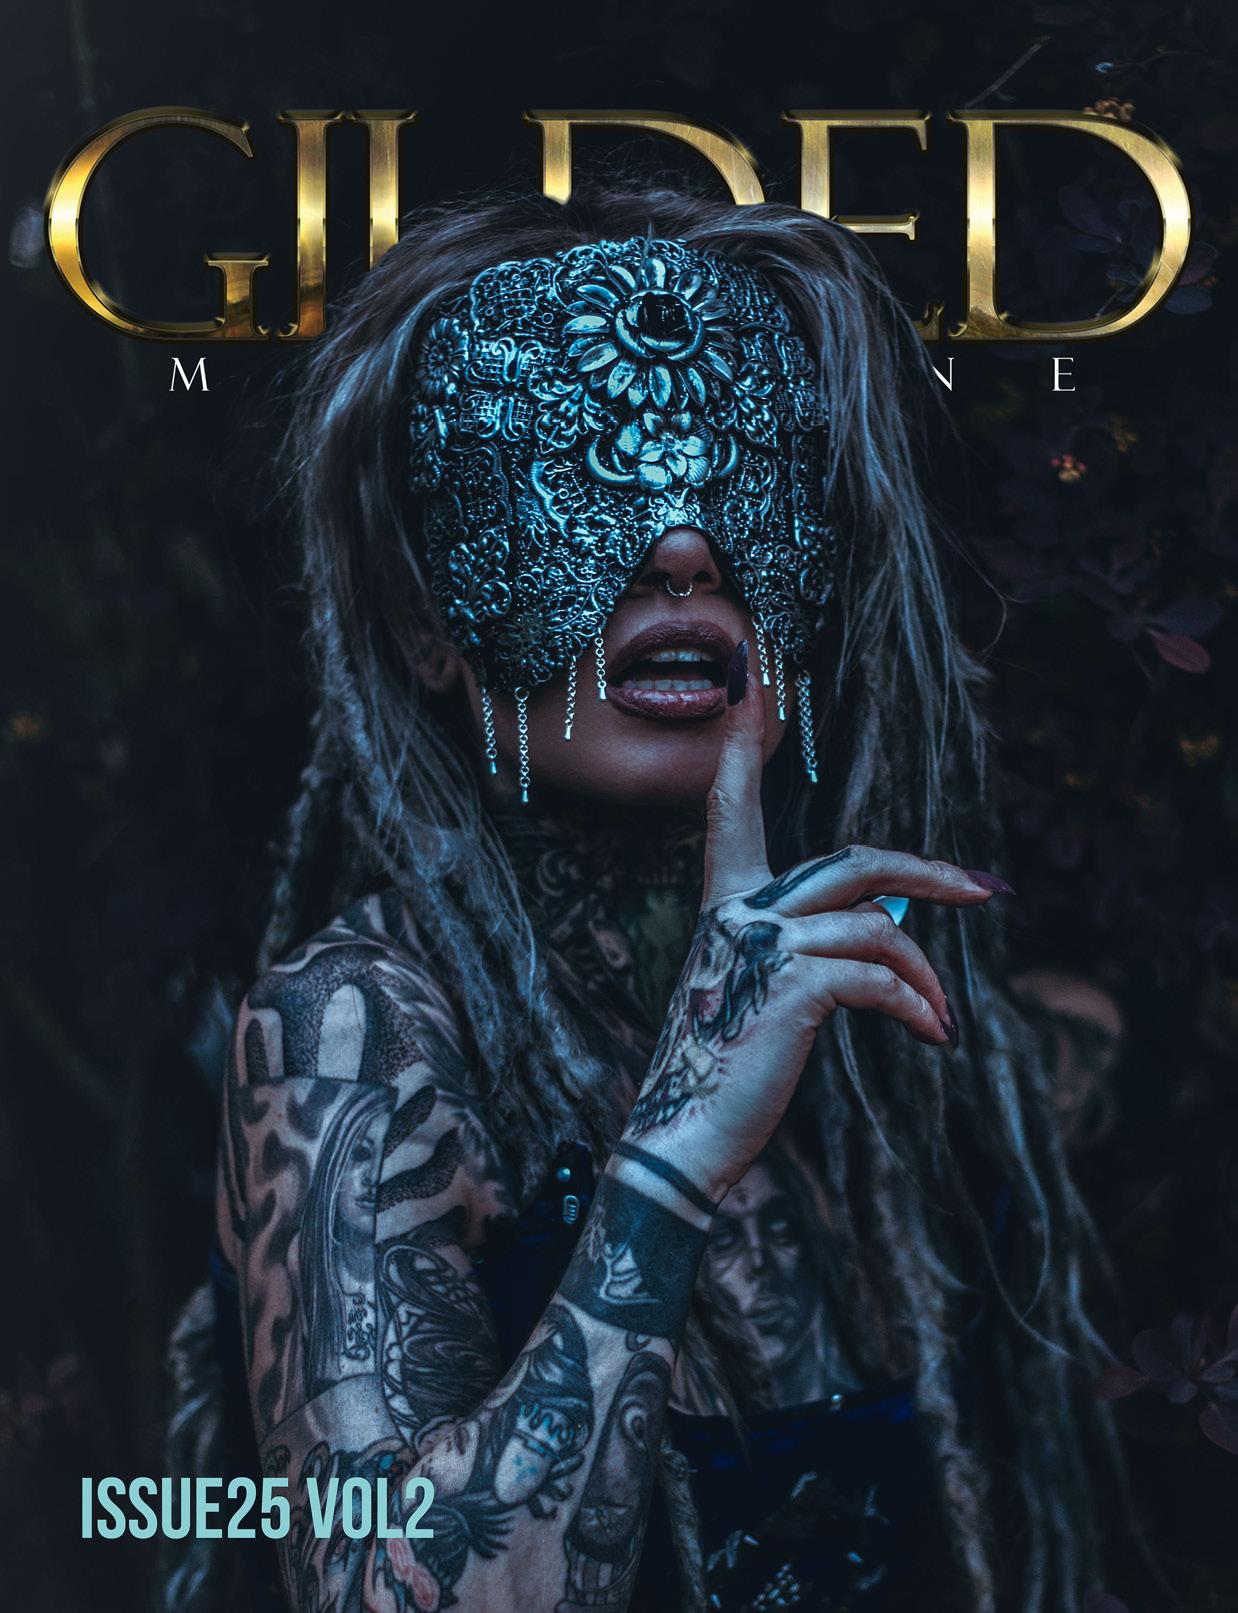 Gilded-Issue025Vol2-0.jpg